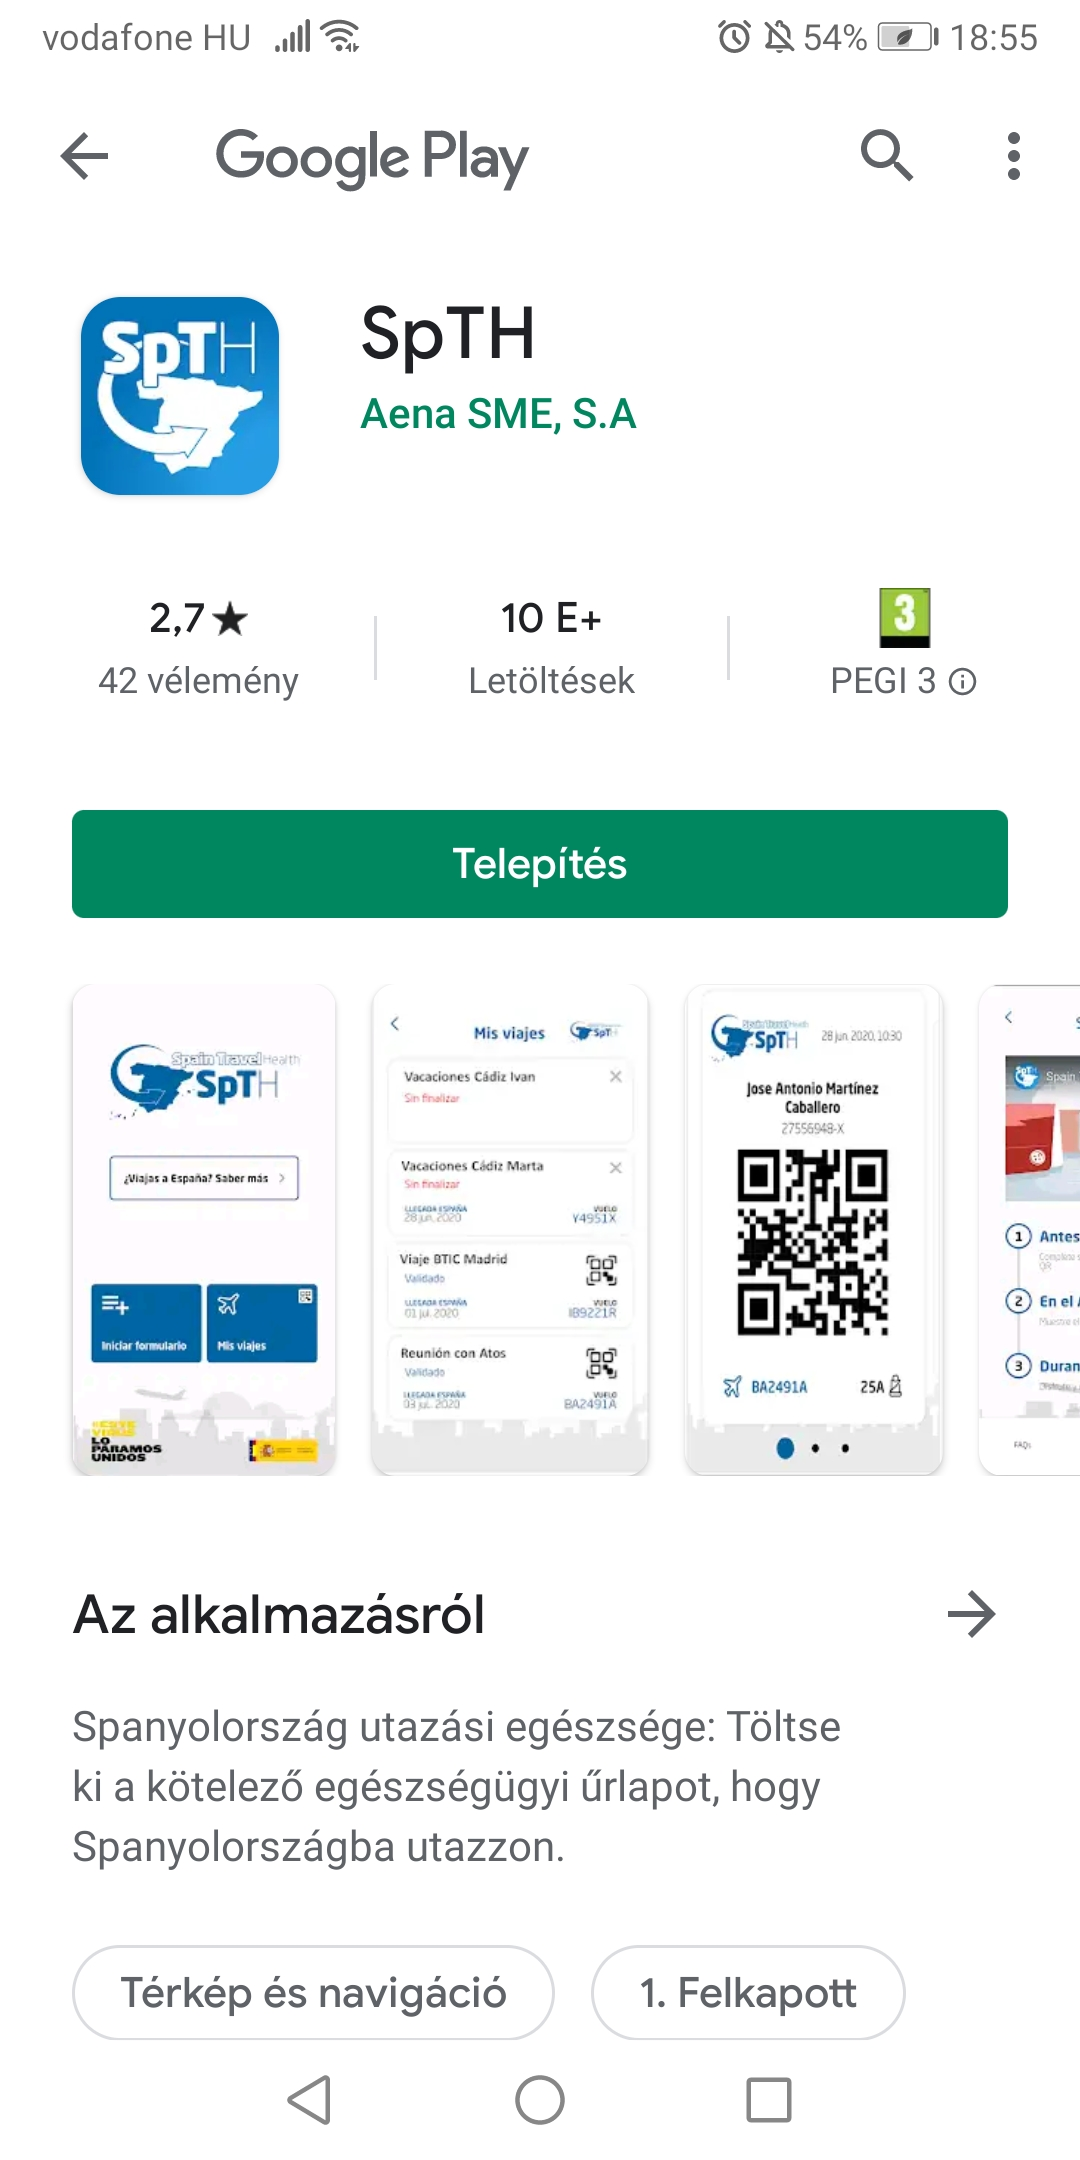 screenshot_20200703_185522_com_android_vending.jpg